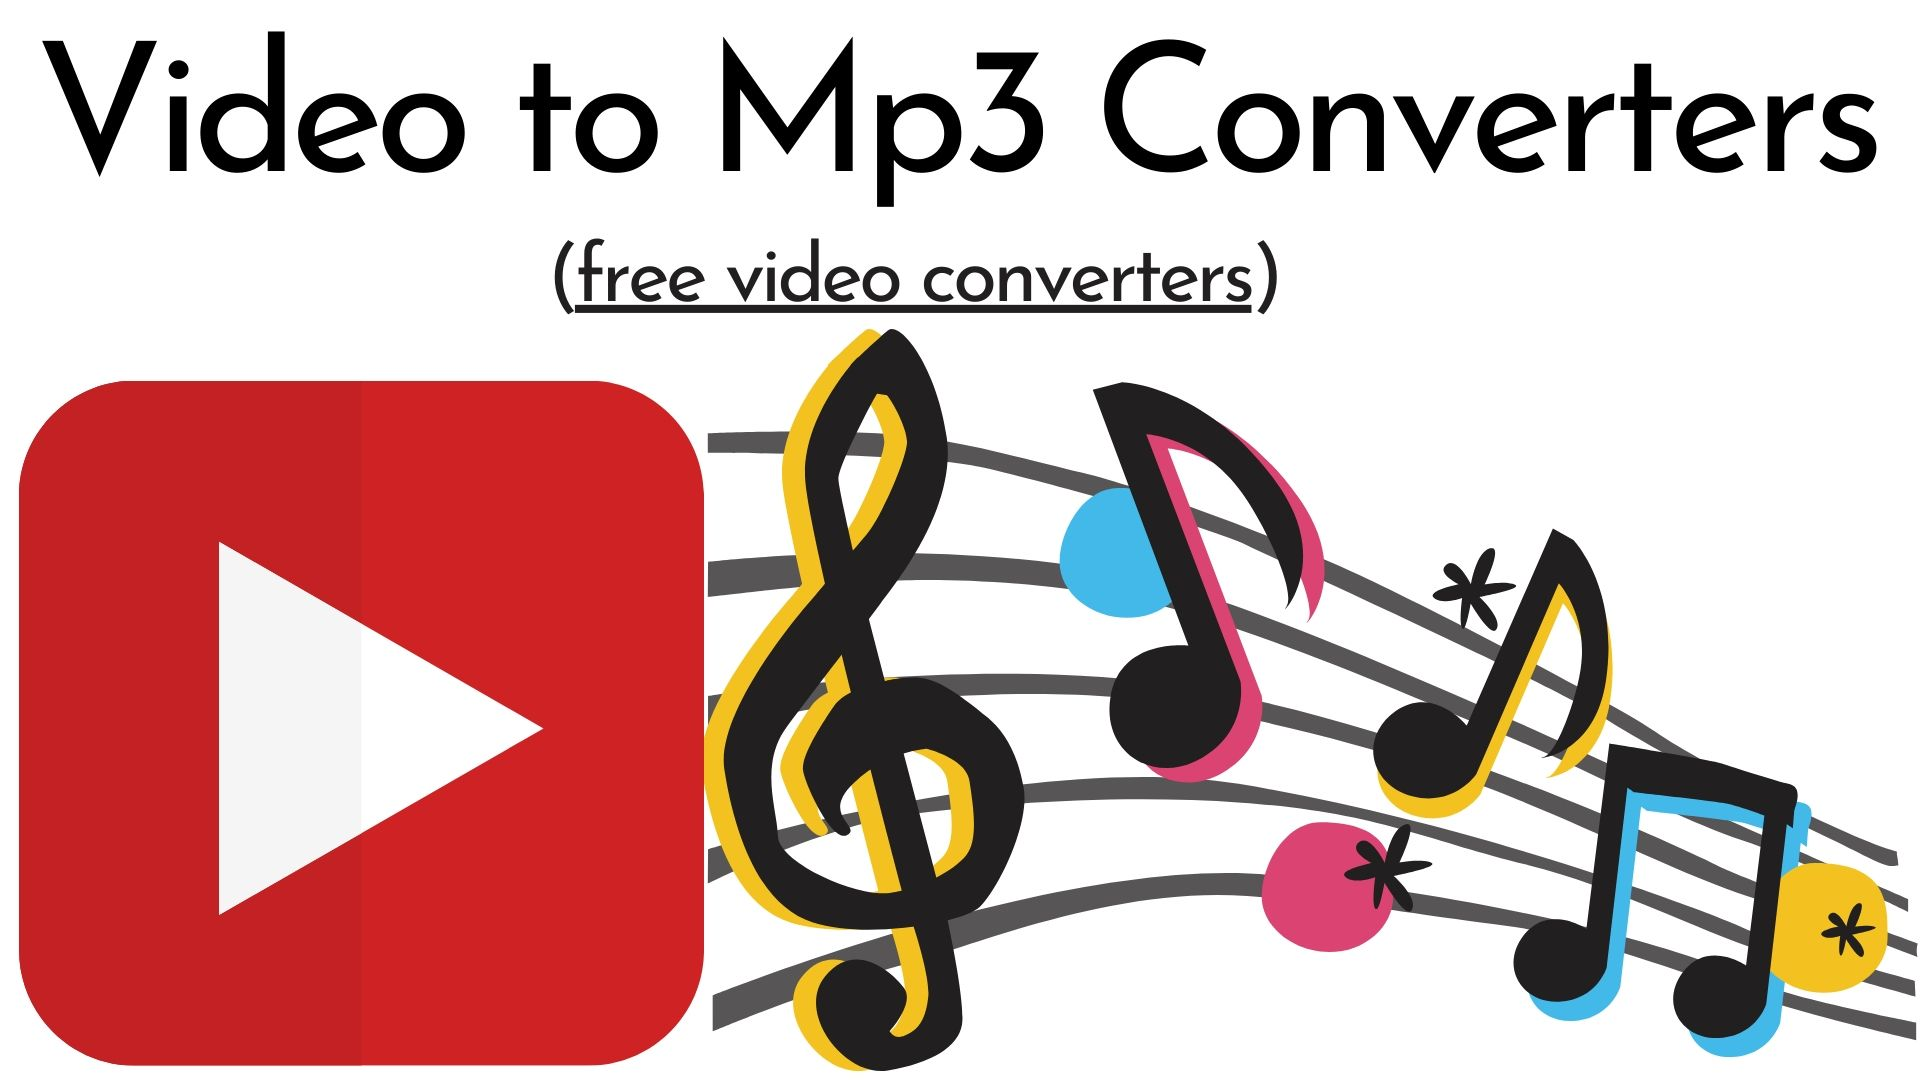 Video to Mp3 Convertors